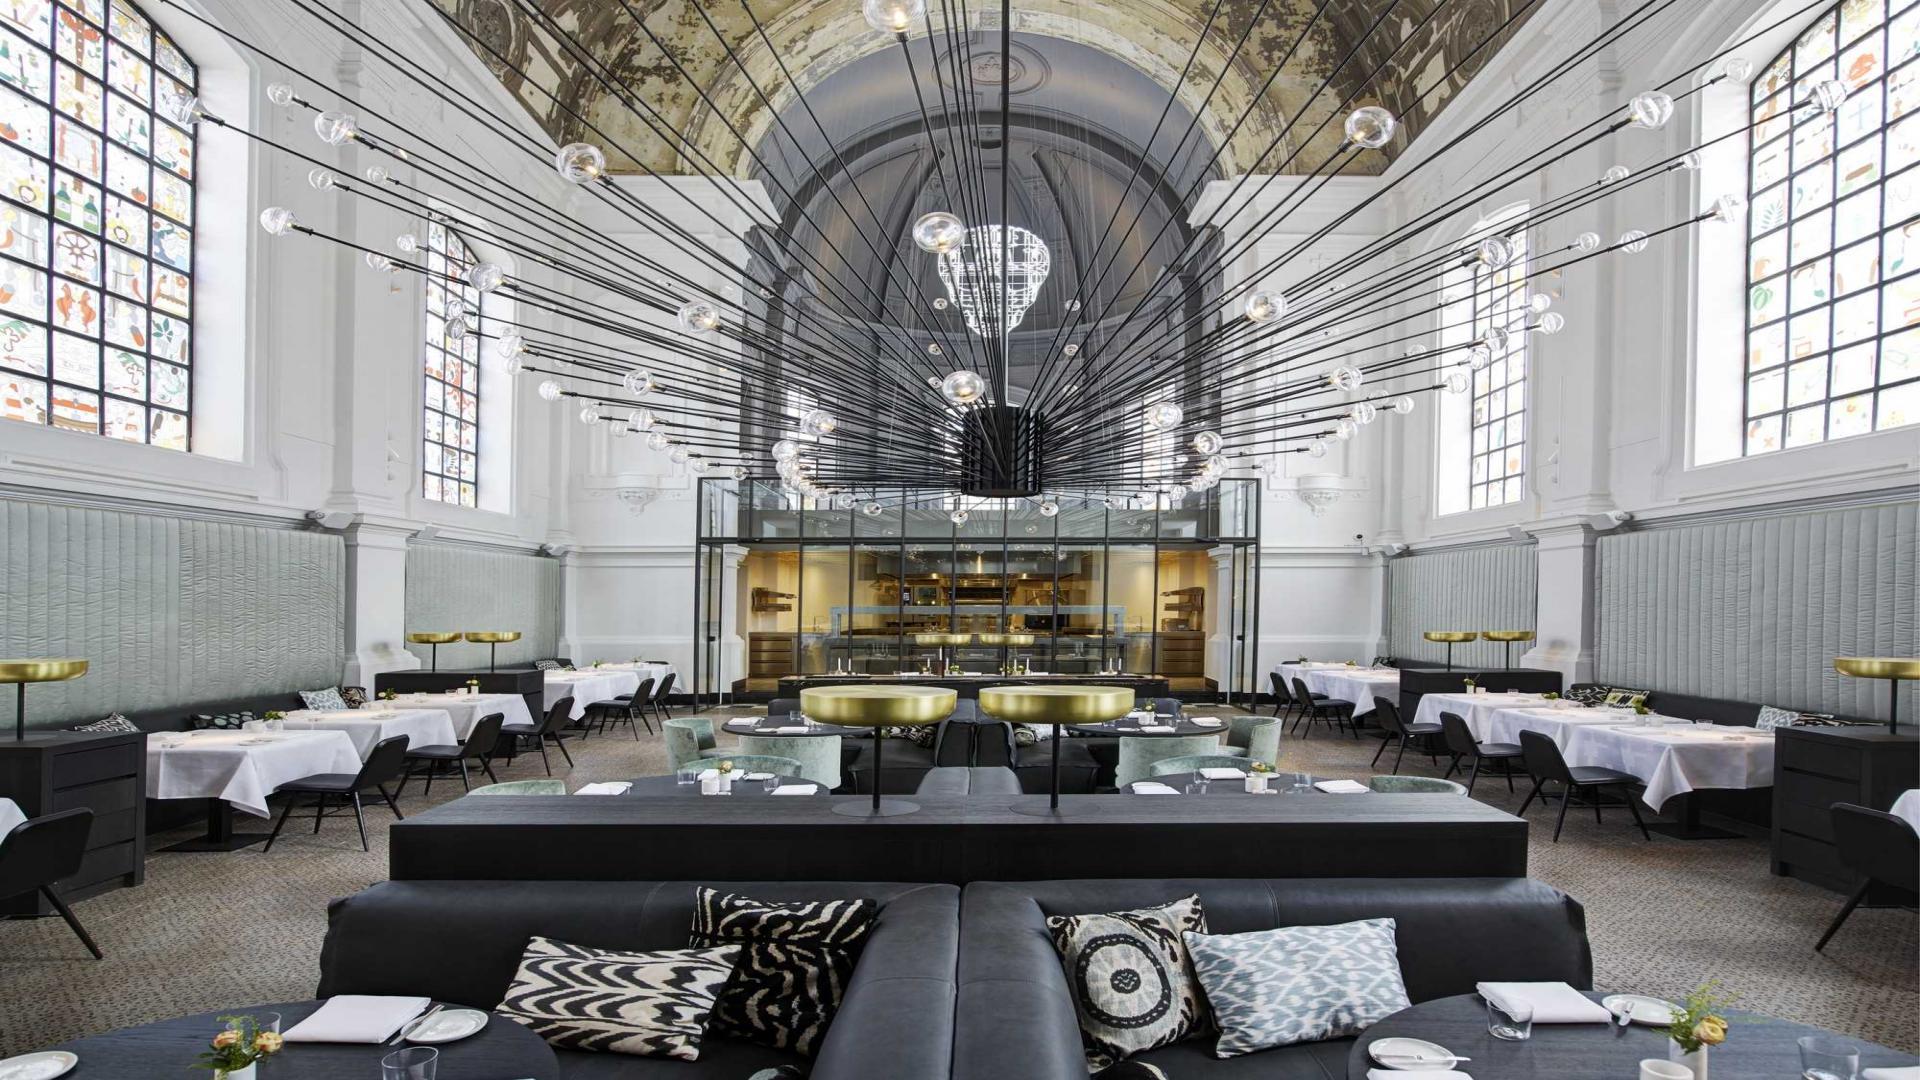 The restaurant bar design award goes to connoisseur s